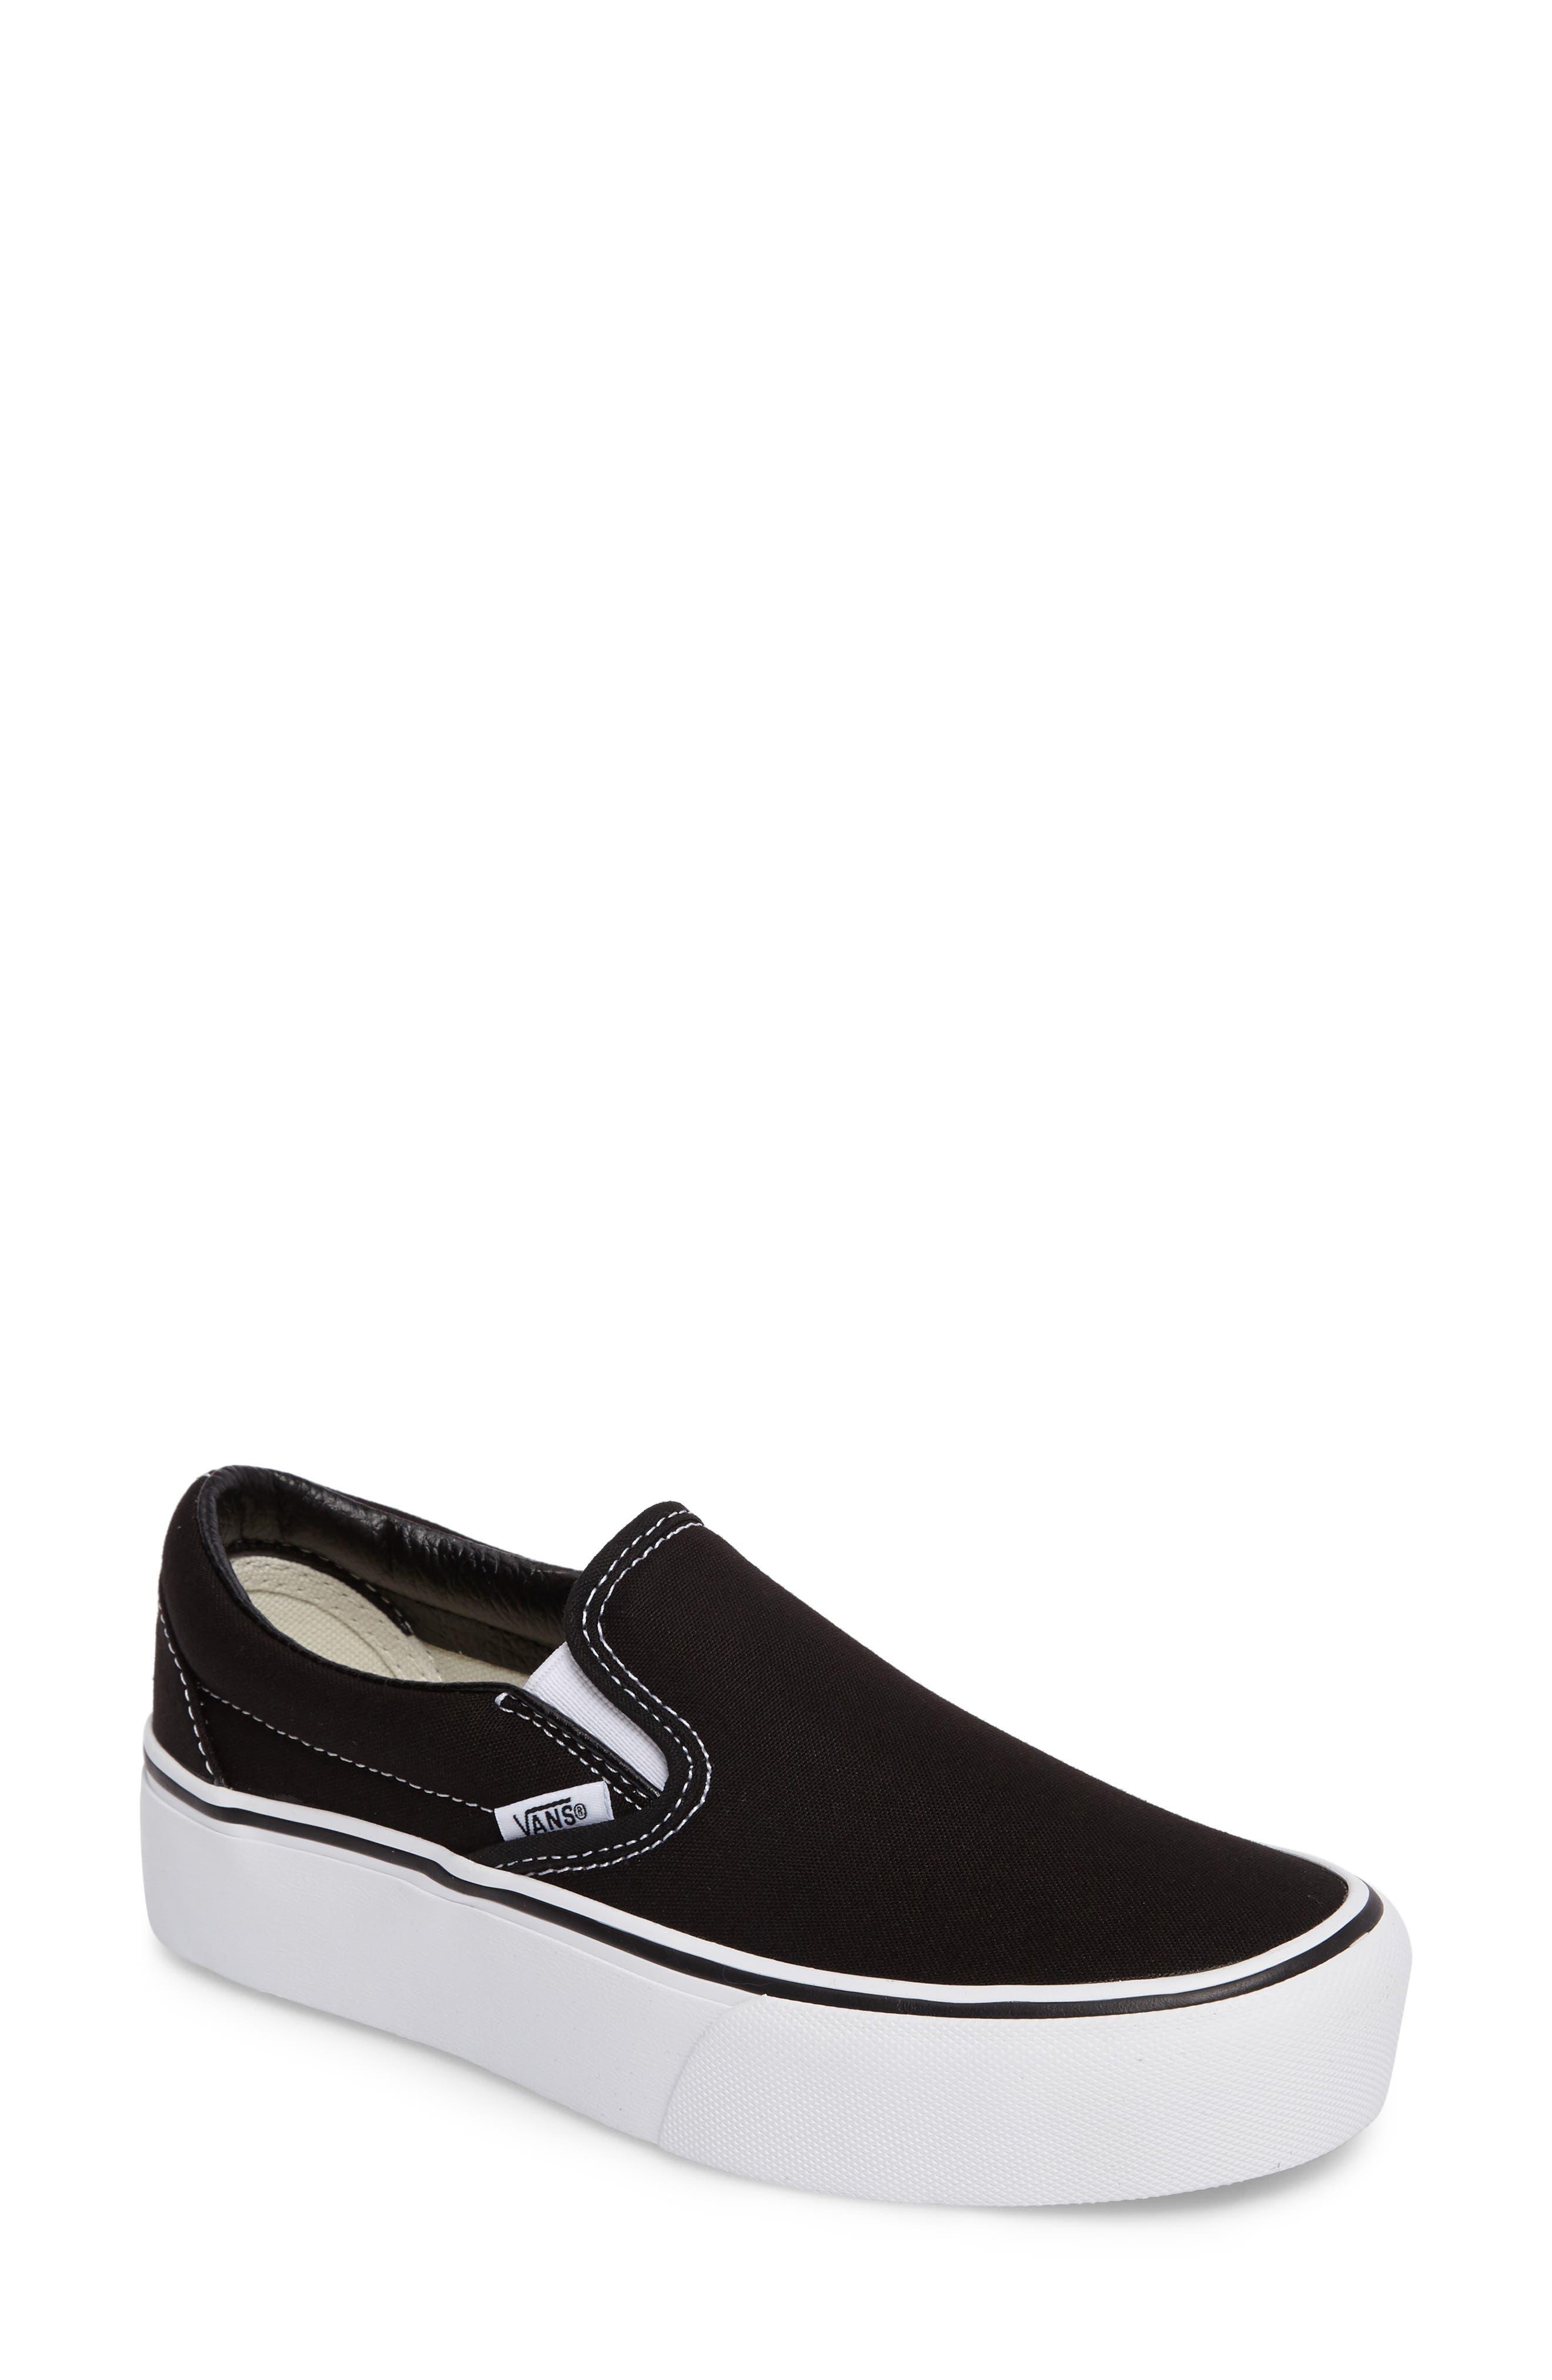 Vans Platform Slip-On Sneaker- Black